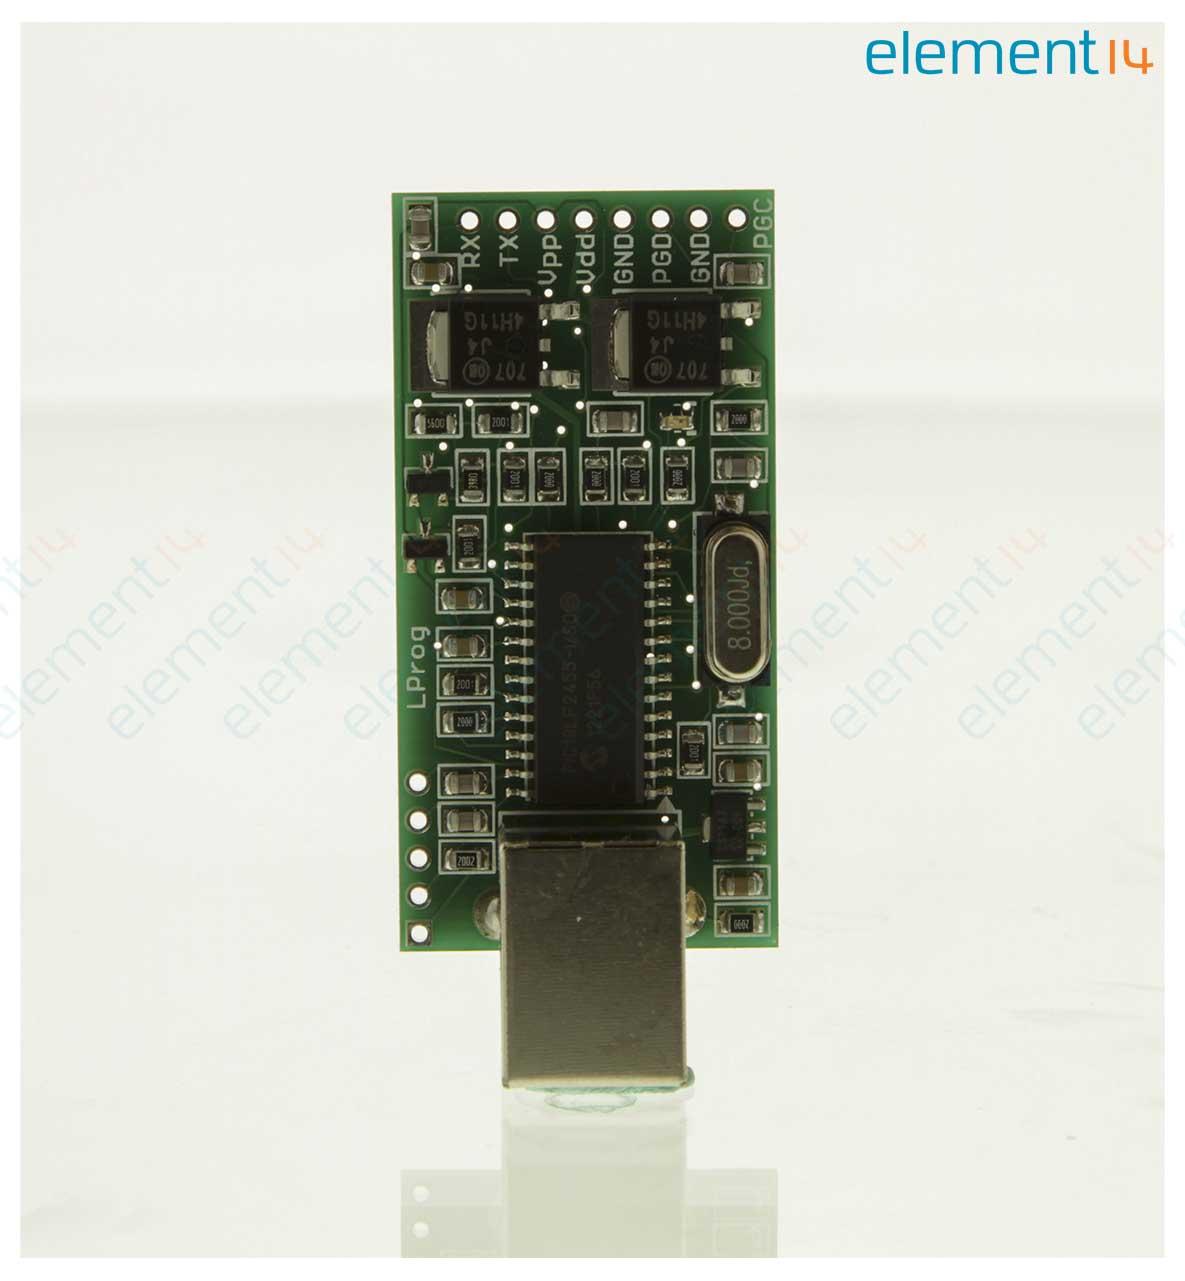 Temlp001 Microchip Lprog Programmer Usb Powered Light Weight Usbpowered Pic Circuit Schematic